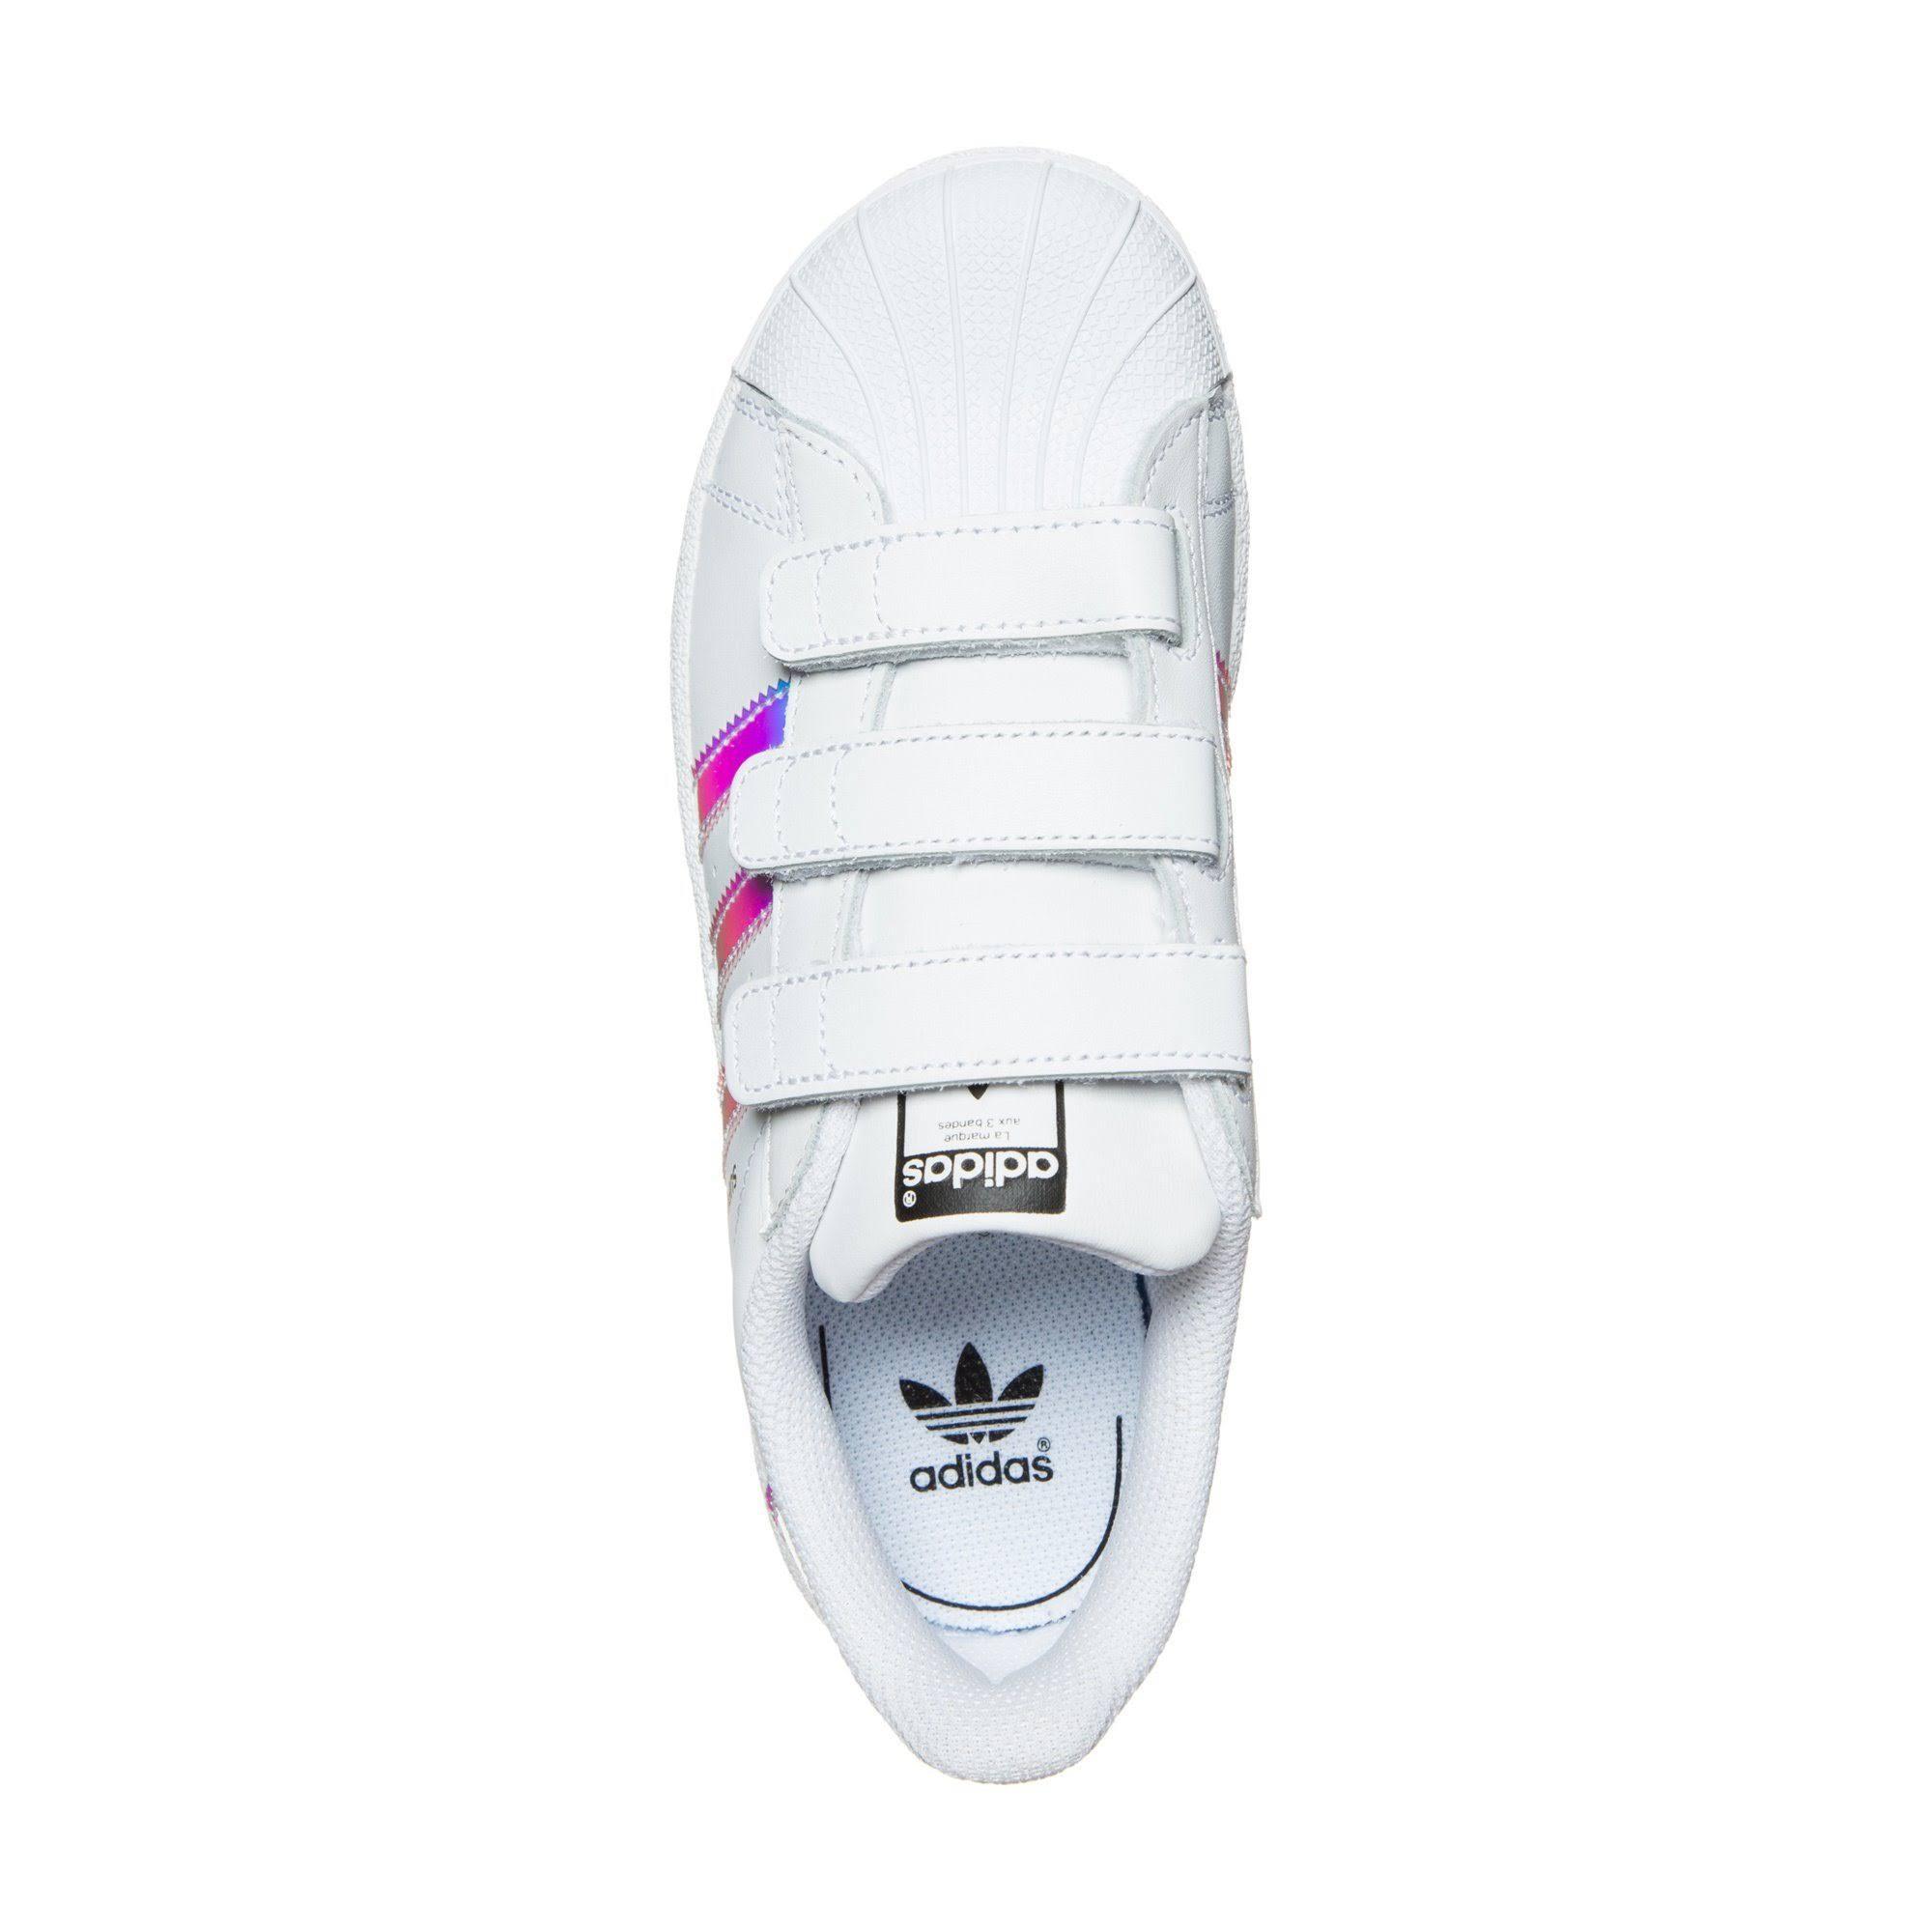 Aq6279 m35 Silver White Weiß Adidas metal 28t gAUwWq